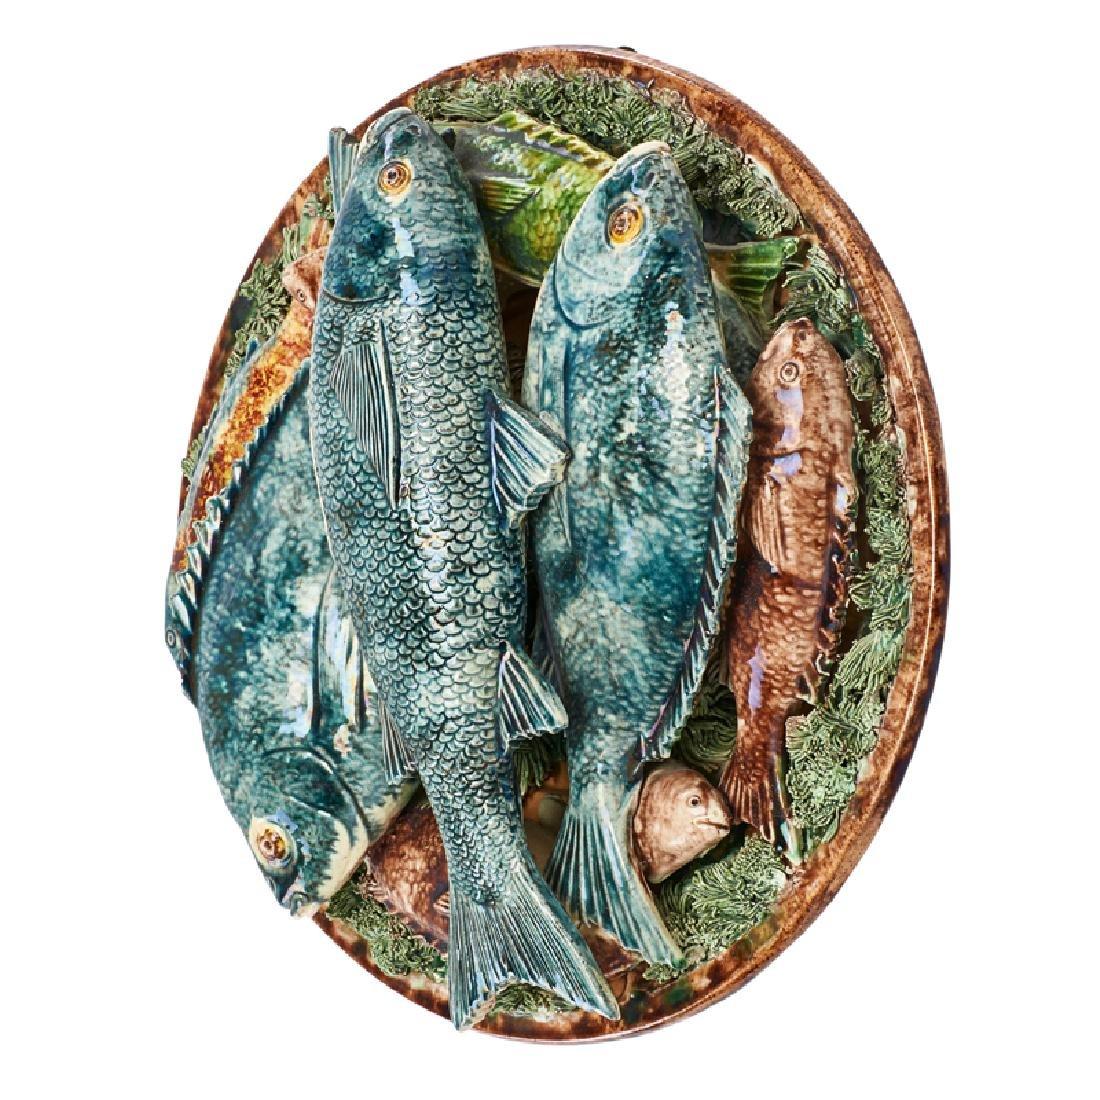 PALISSYWARE FIGURAL FISH PLAQUE - 2